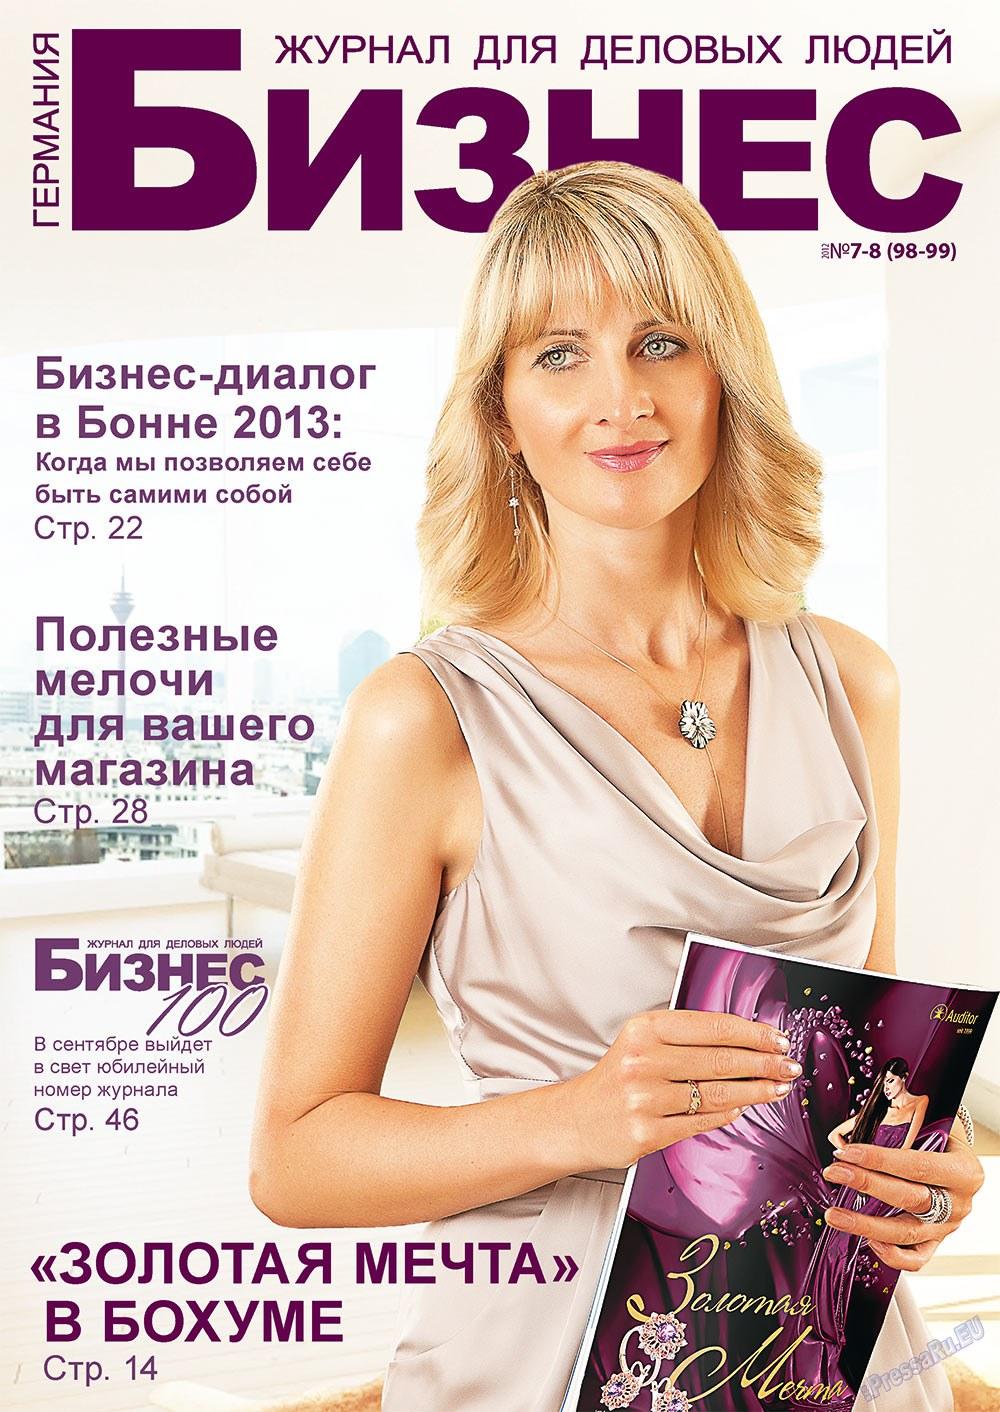 Бизнес (журнал). 2012 год, номер 7, стр. 1